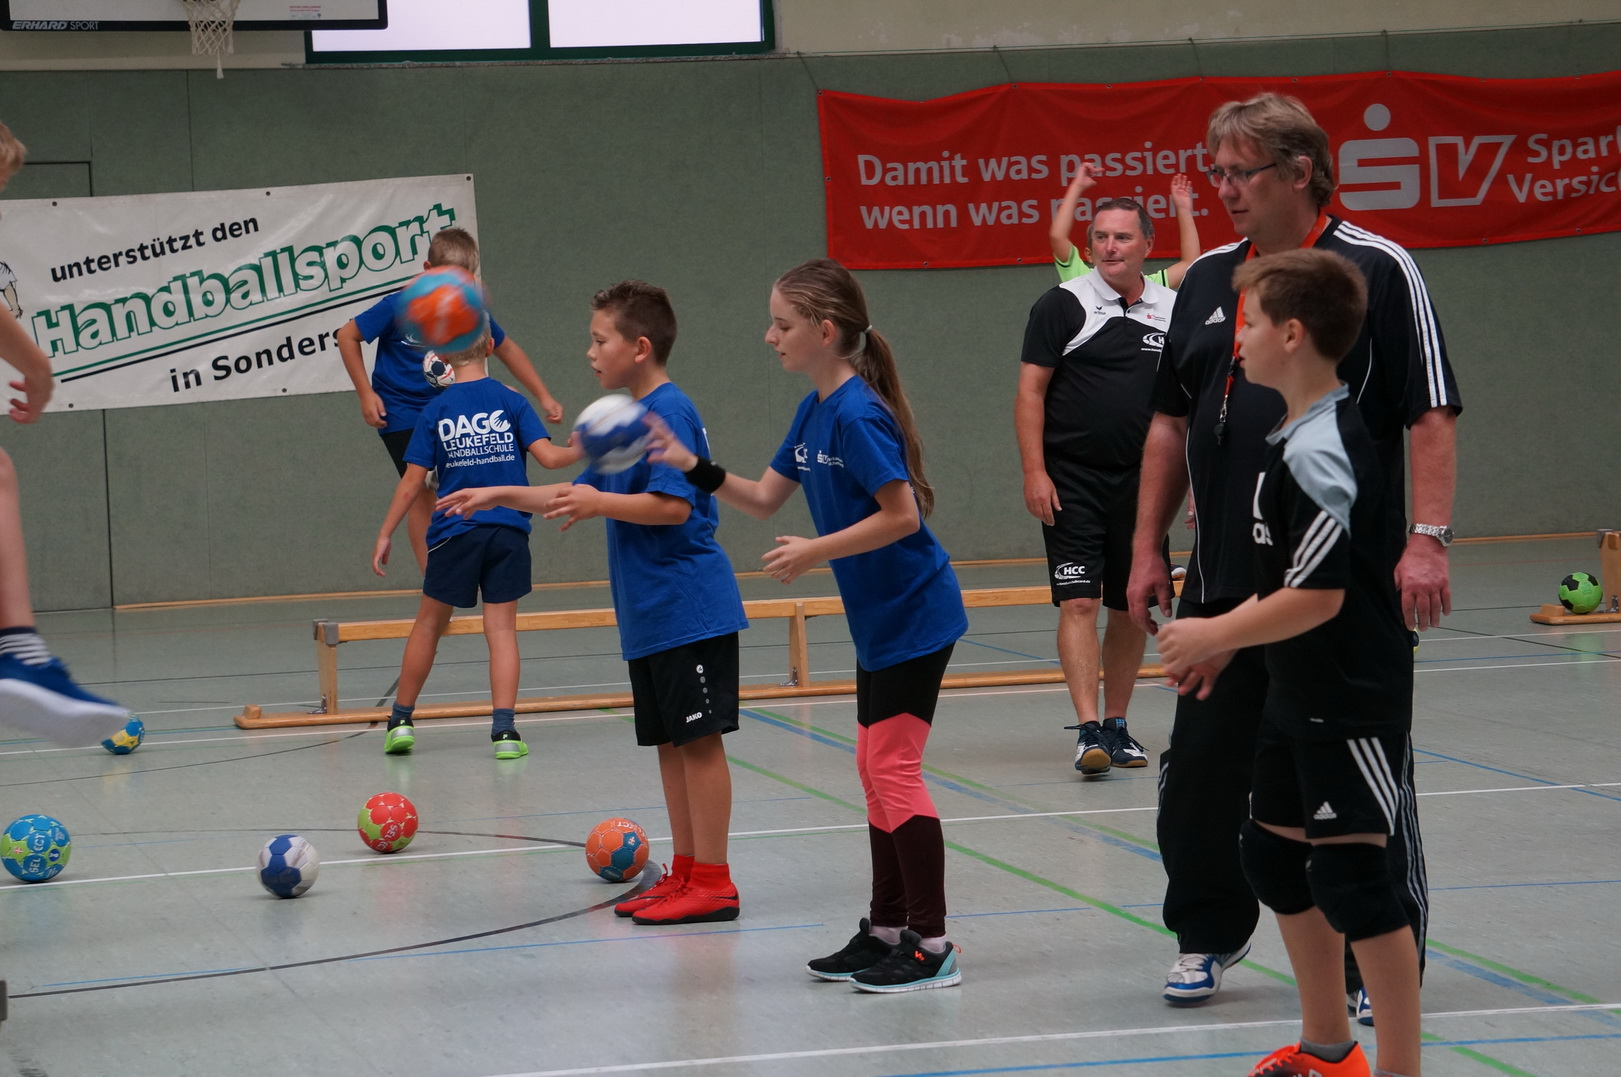 201808_Handballcamp_SDH_MG_174w